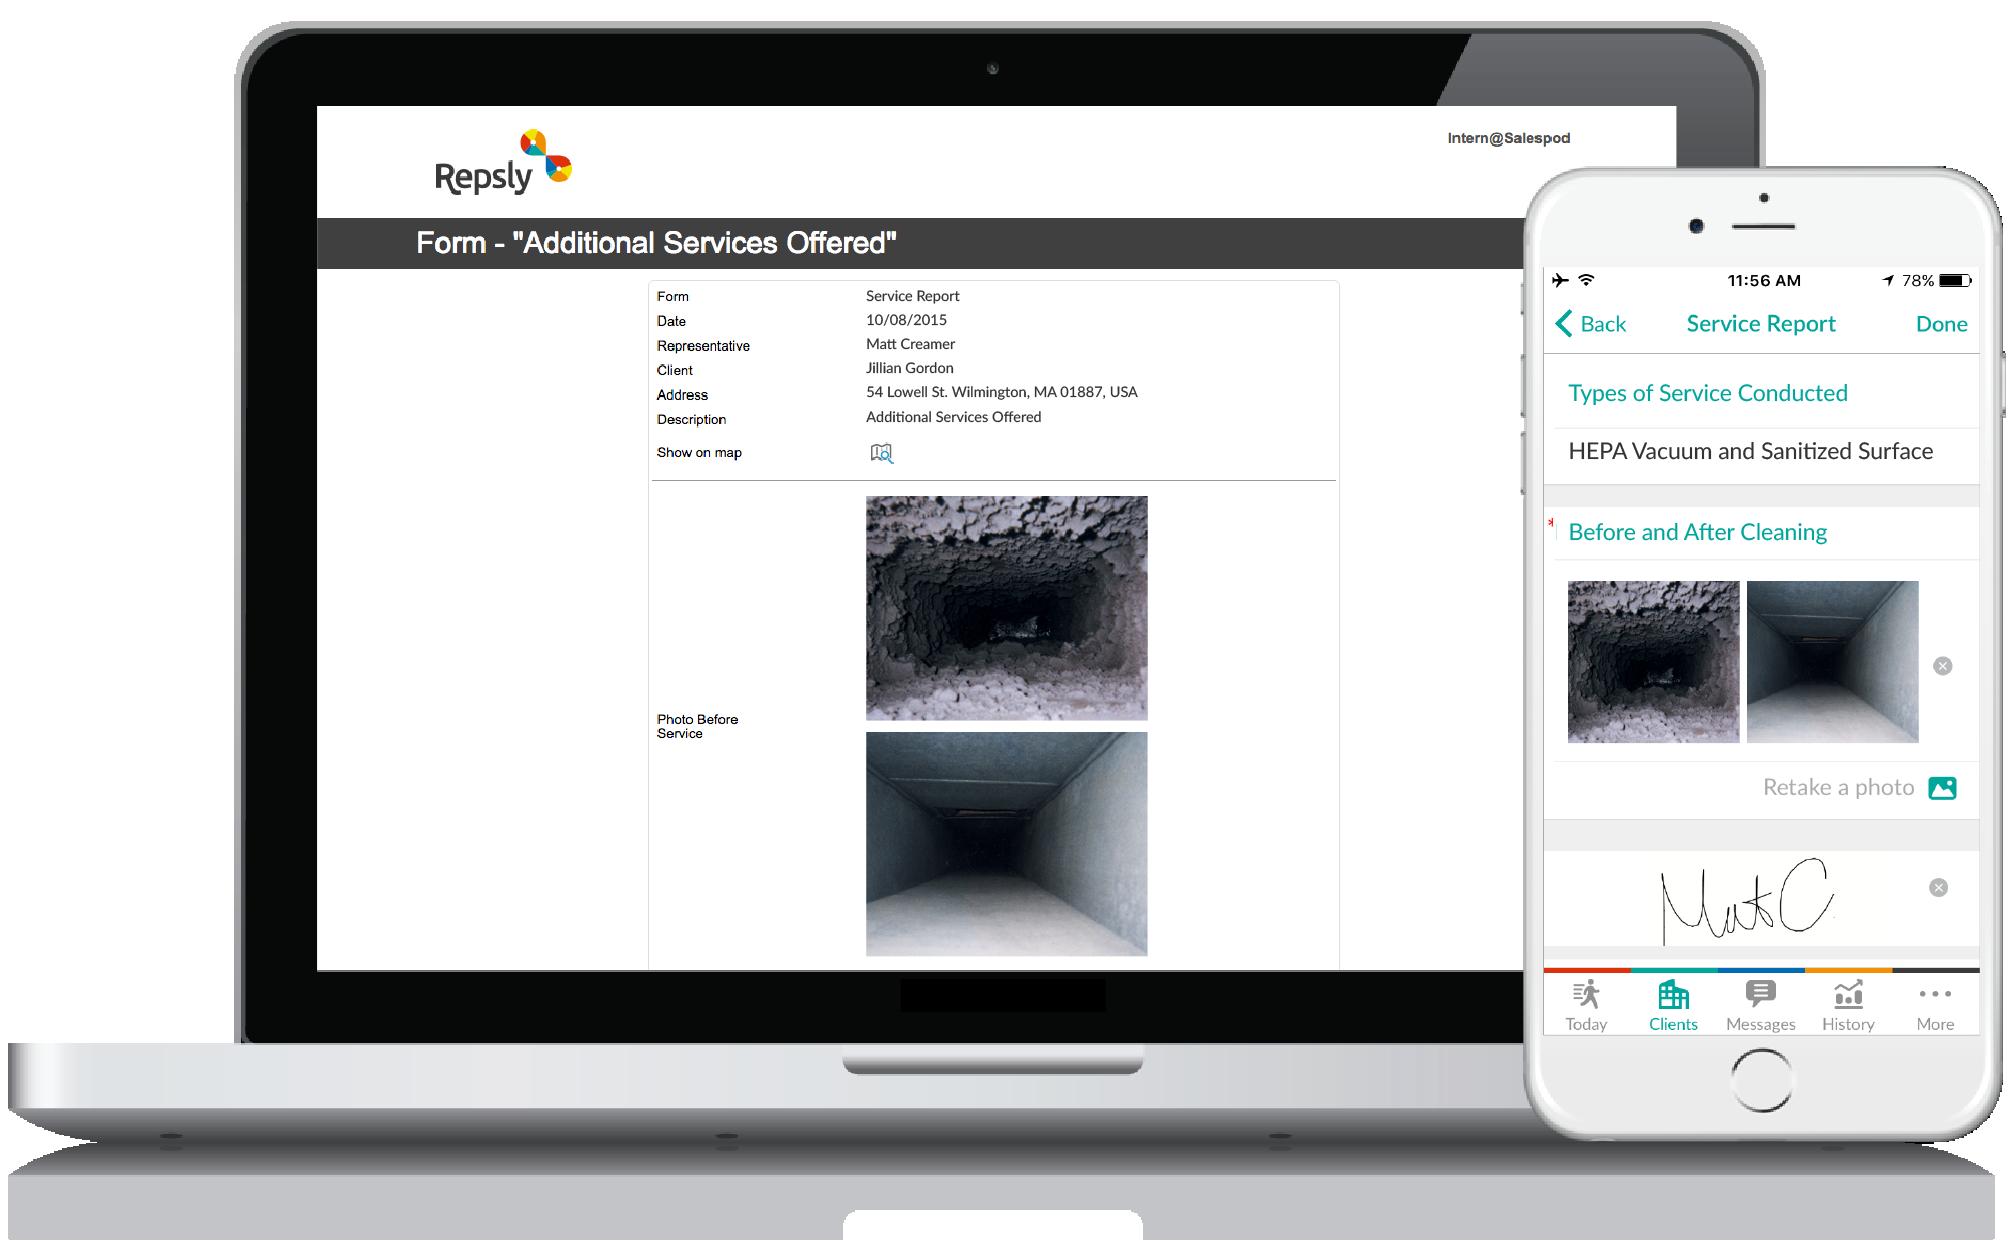 HVAC Service Software Mobile forms